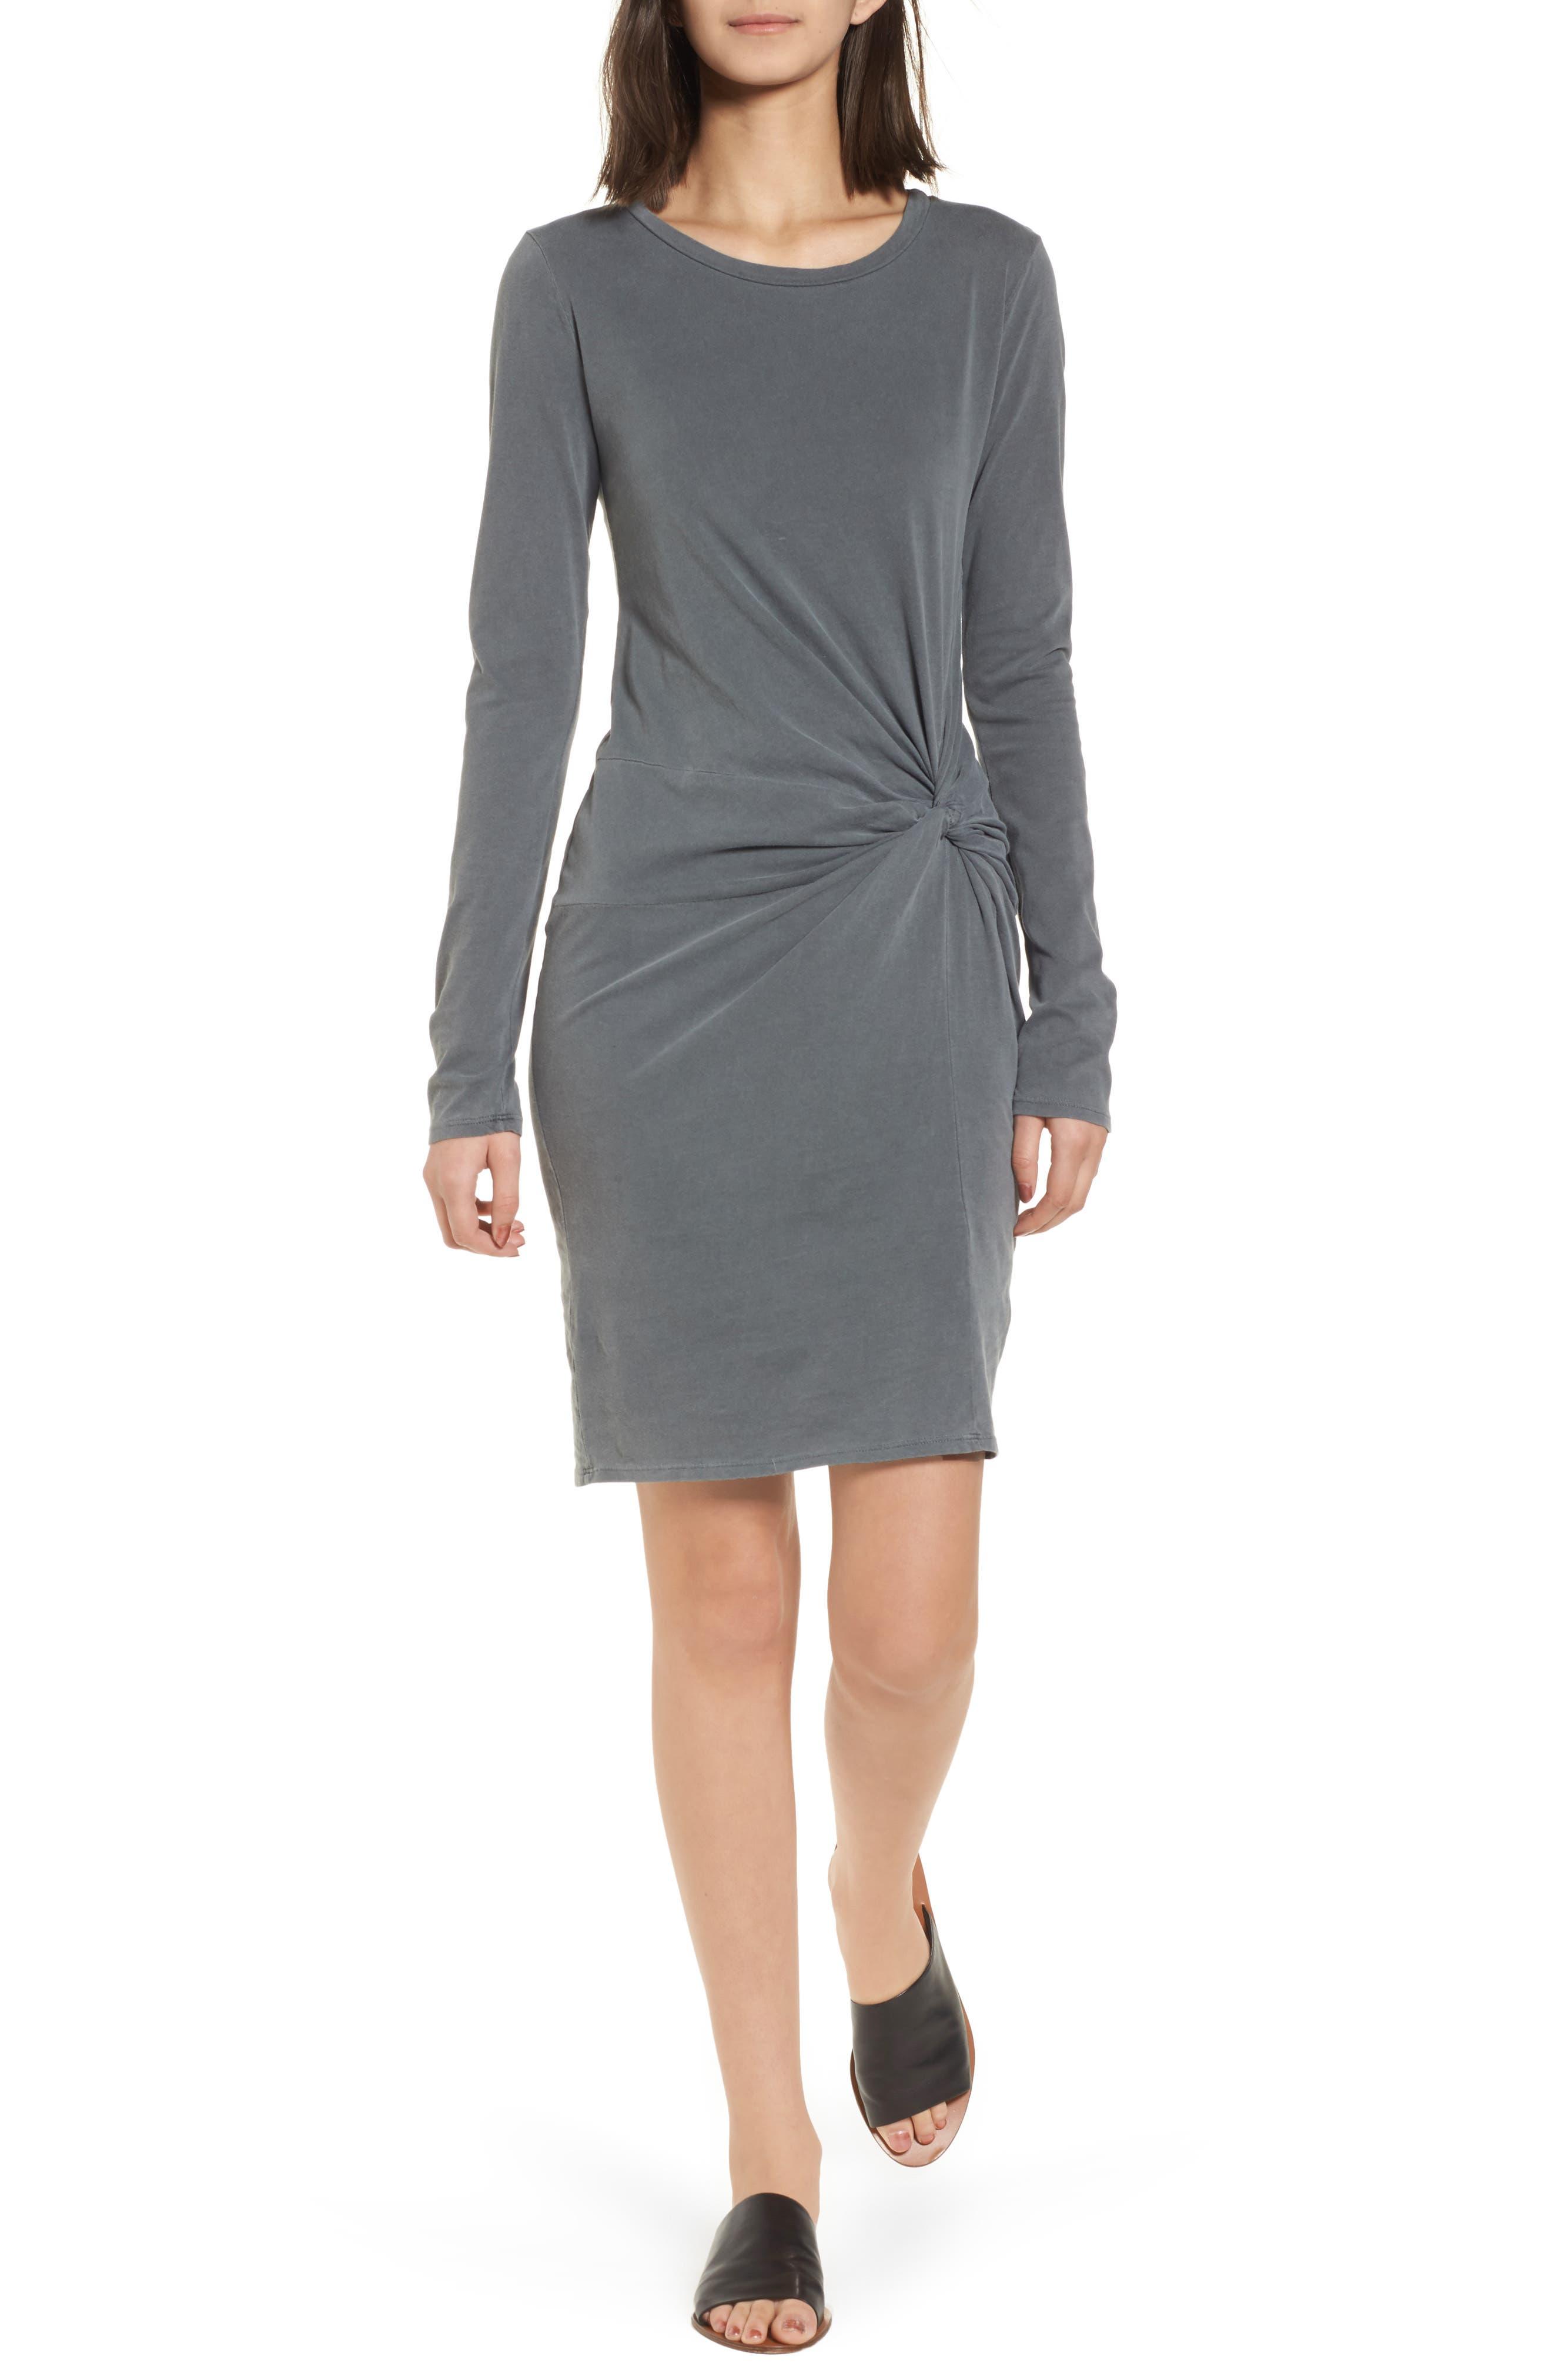 Alternate Image 1 Selected - Stateside Twist Dress